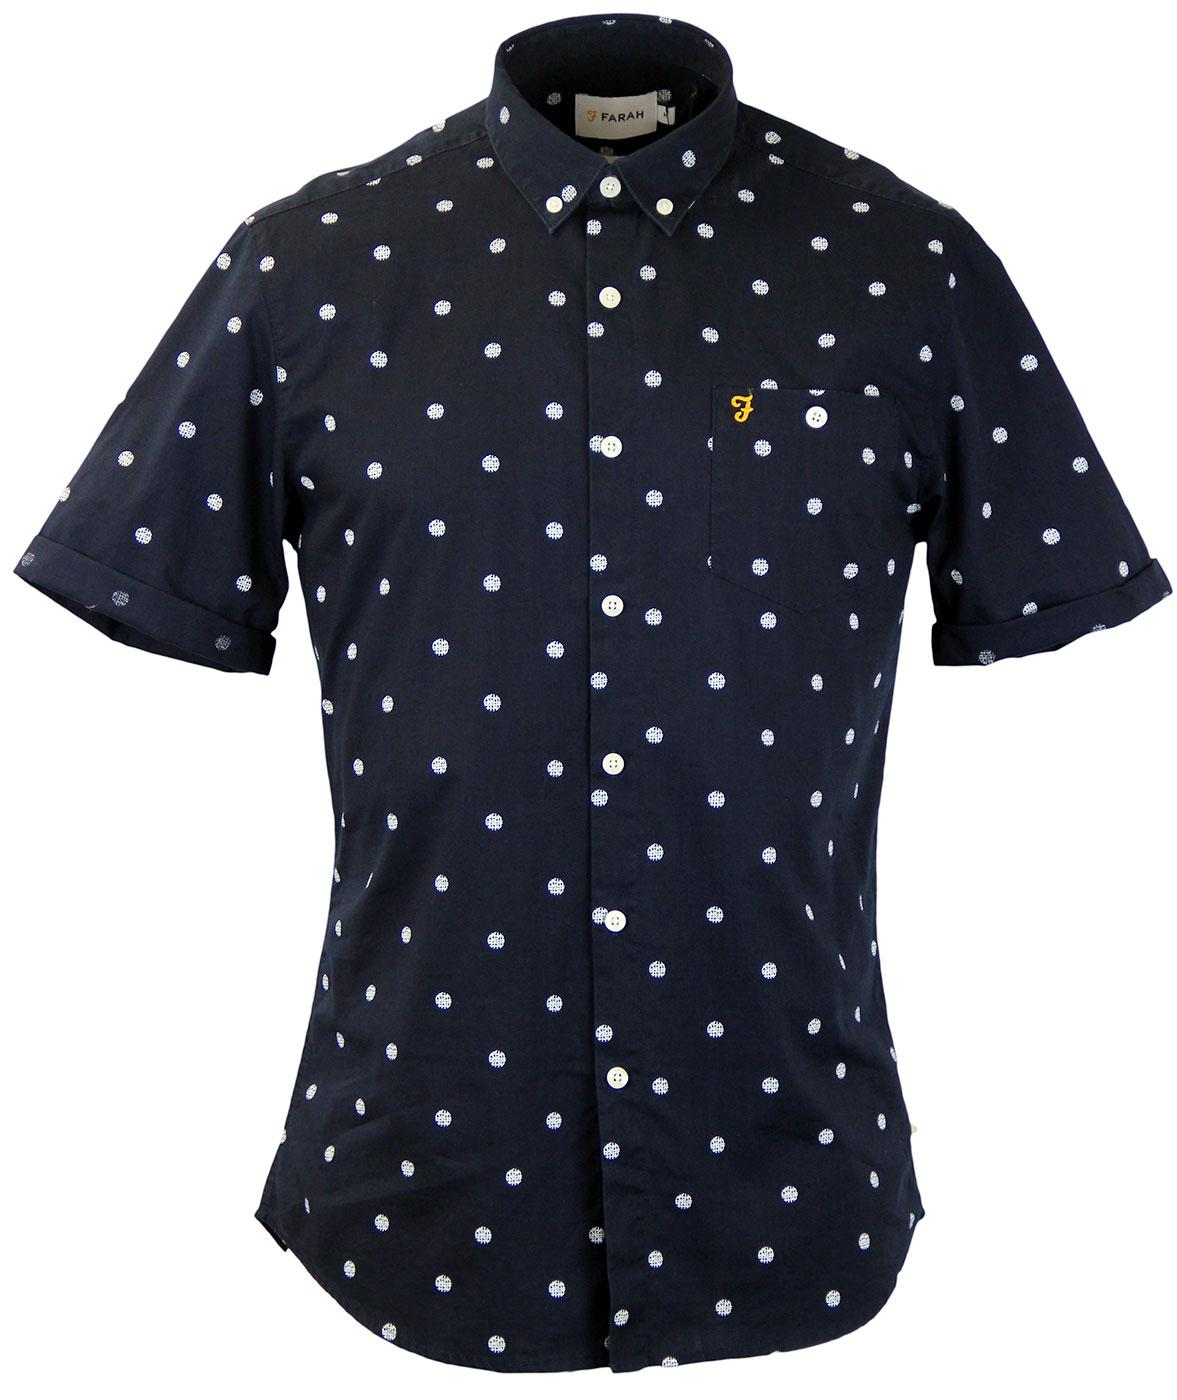 Victor FARAH VINTAGE Retro Etched Polka Dot Shirt